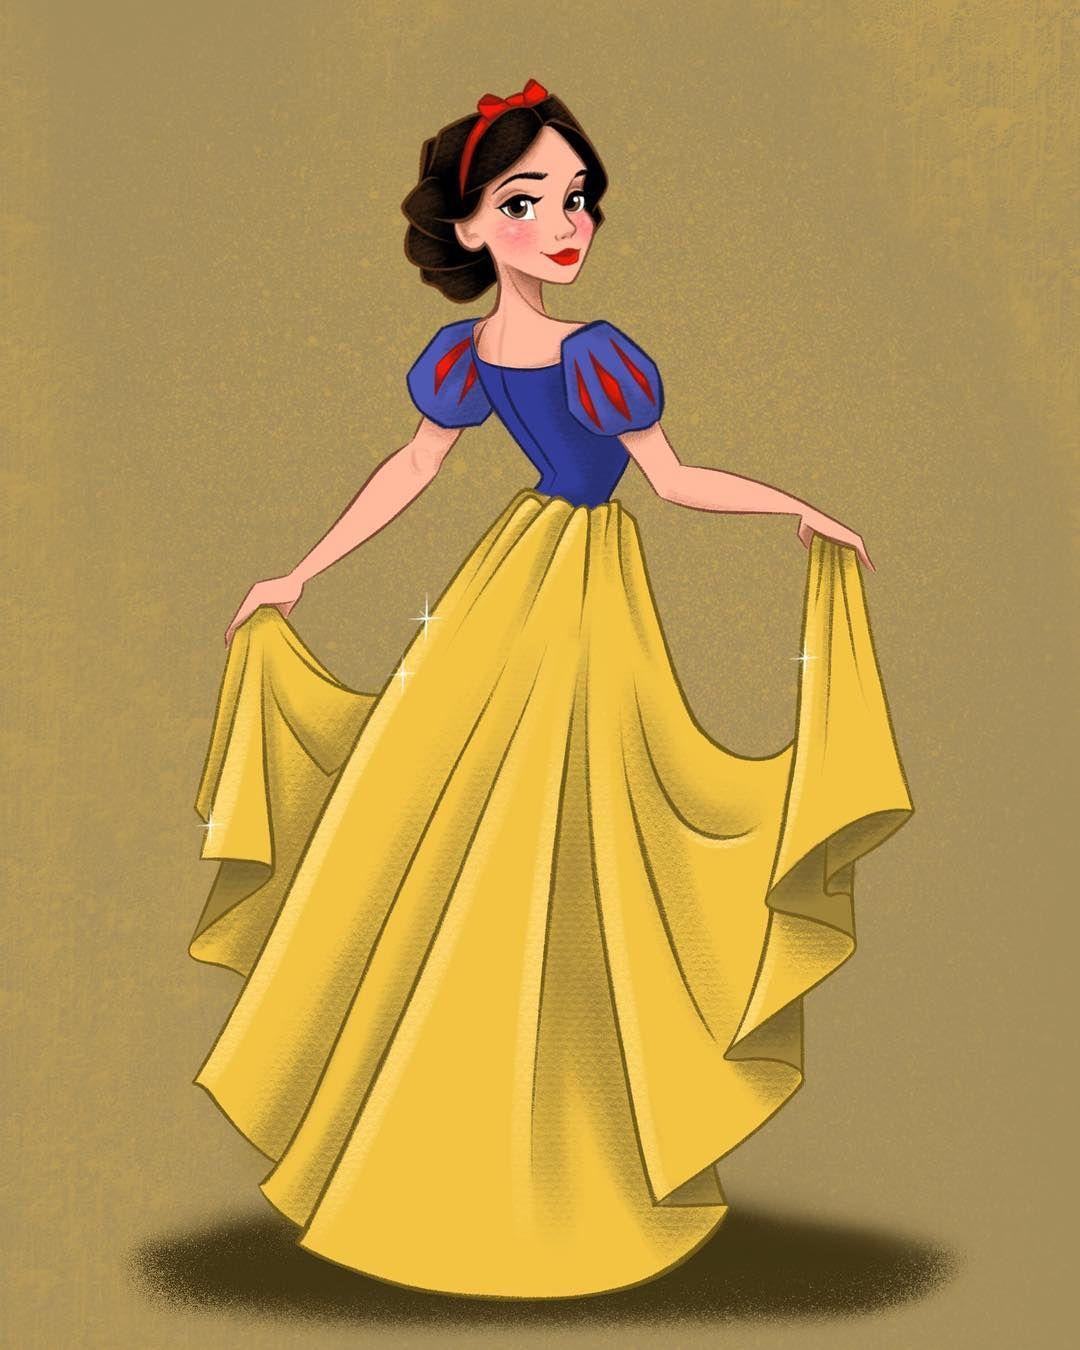 This Is Why Disney Princesses Always Wear Blue This Is Why Disney Princesses Always Wear Blue new foto